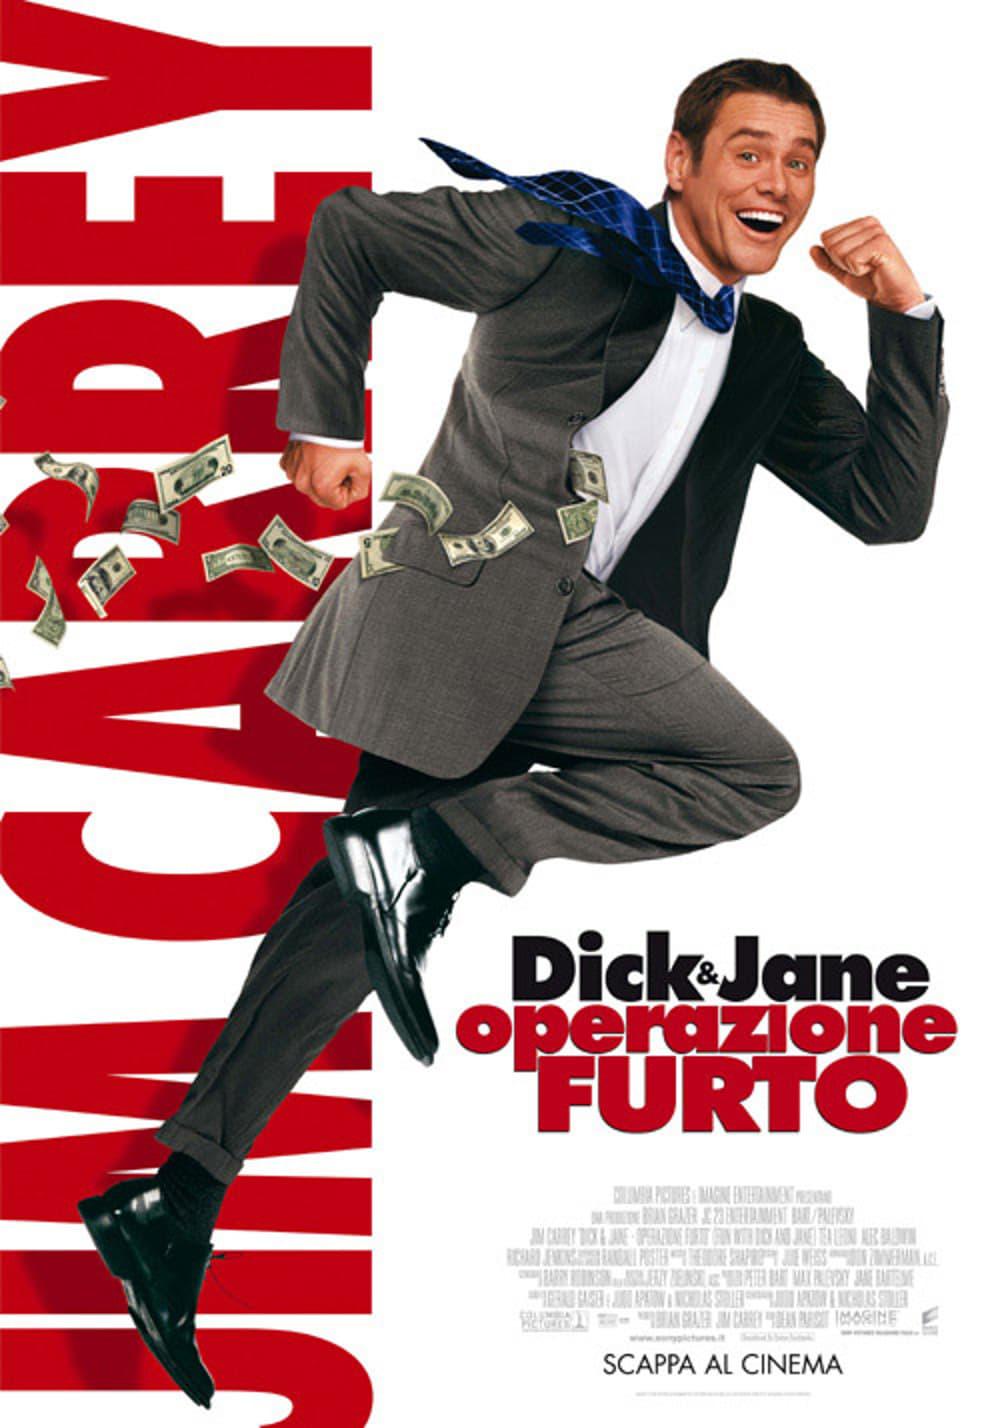 Dick And Jane Film 93